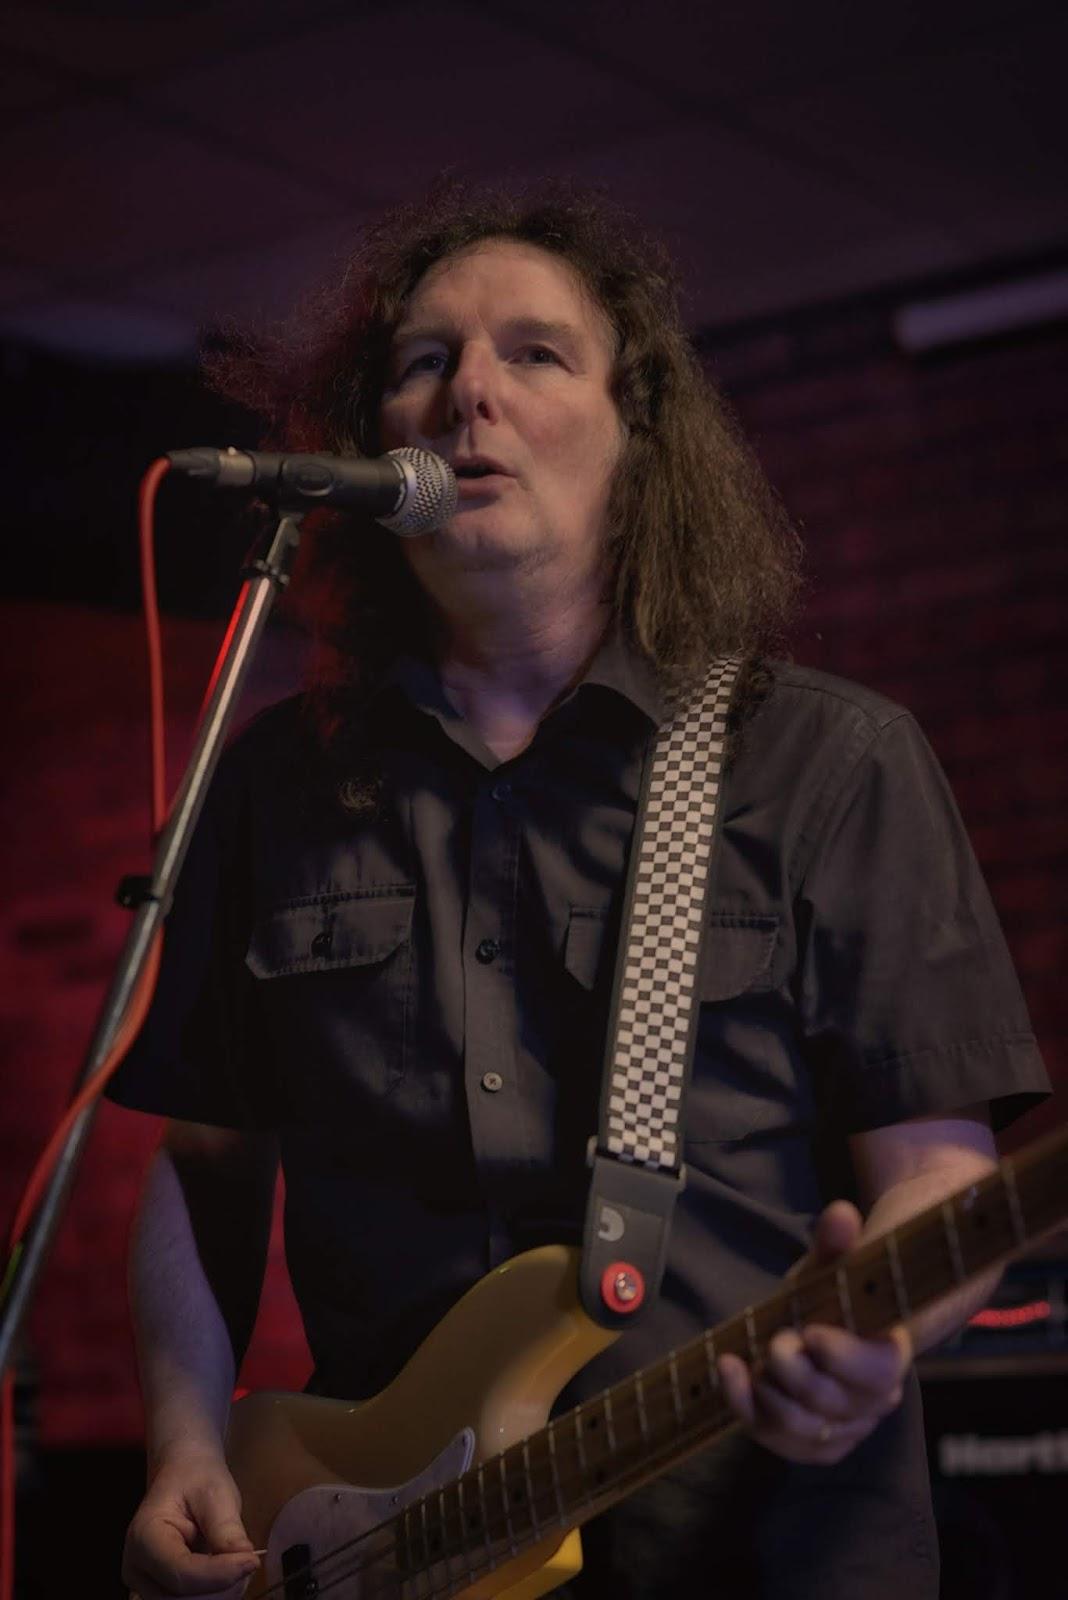 Ian Edmundson